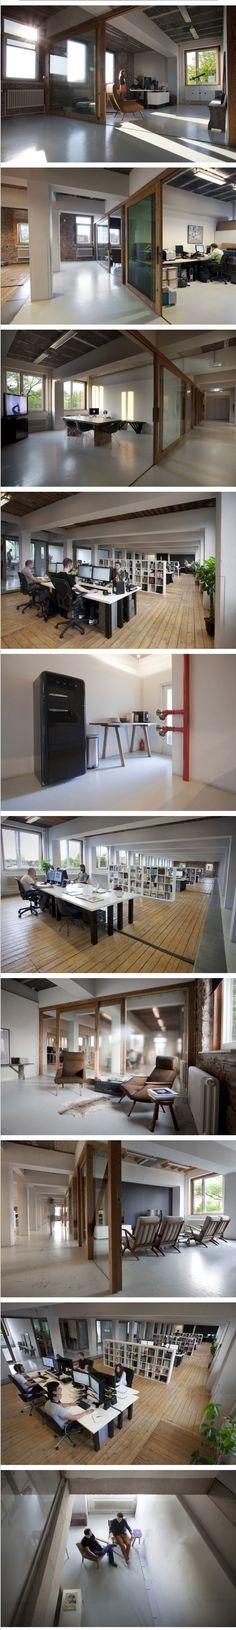 Momkai's Amsterdam Design Studio by Office Snapshots